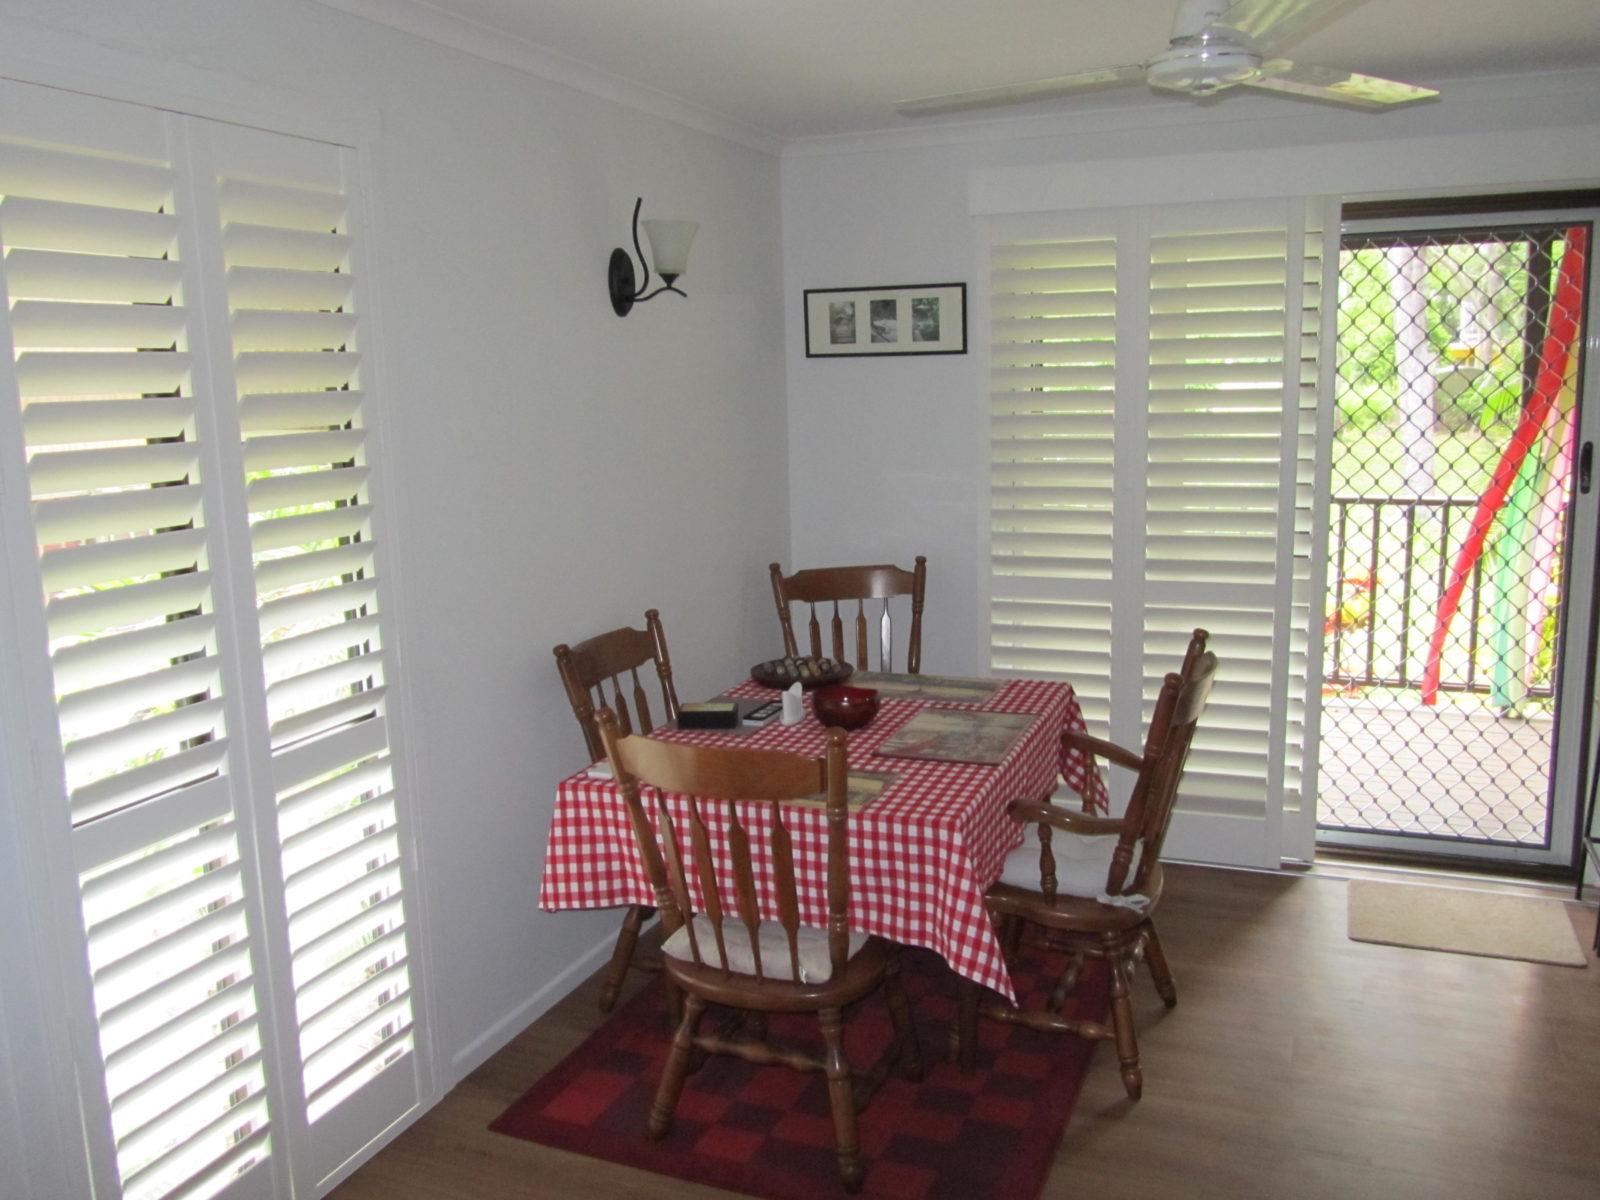 composite van interior shutter shutters gallery windo inch go bay in plantation img window test image